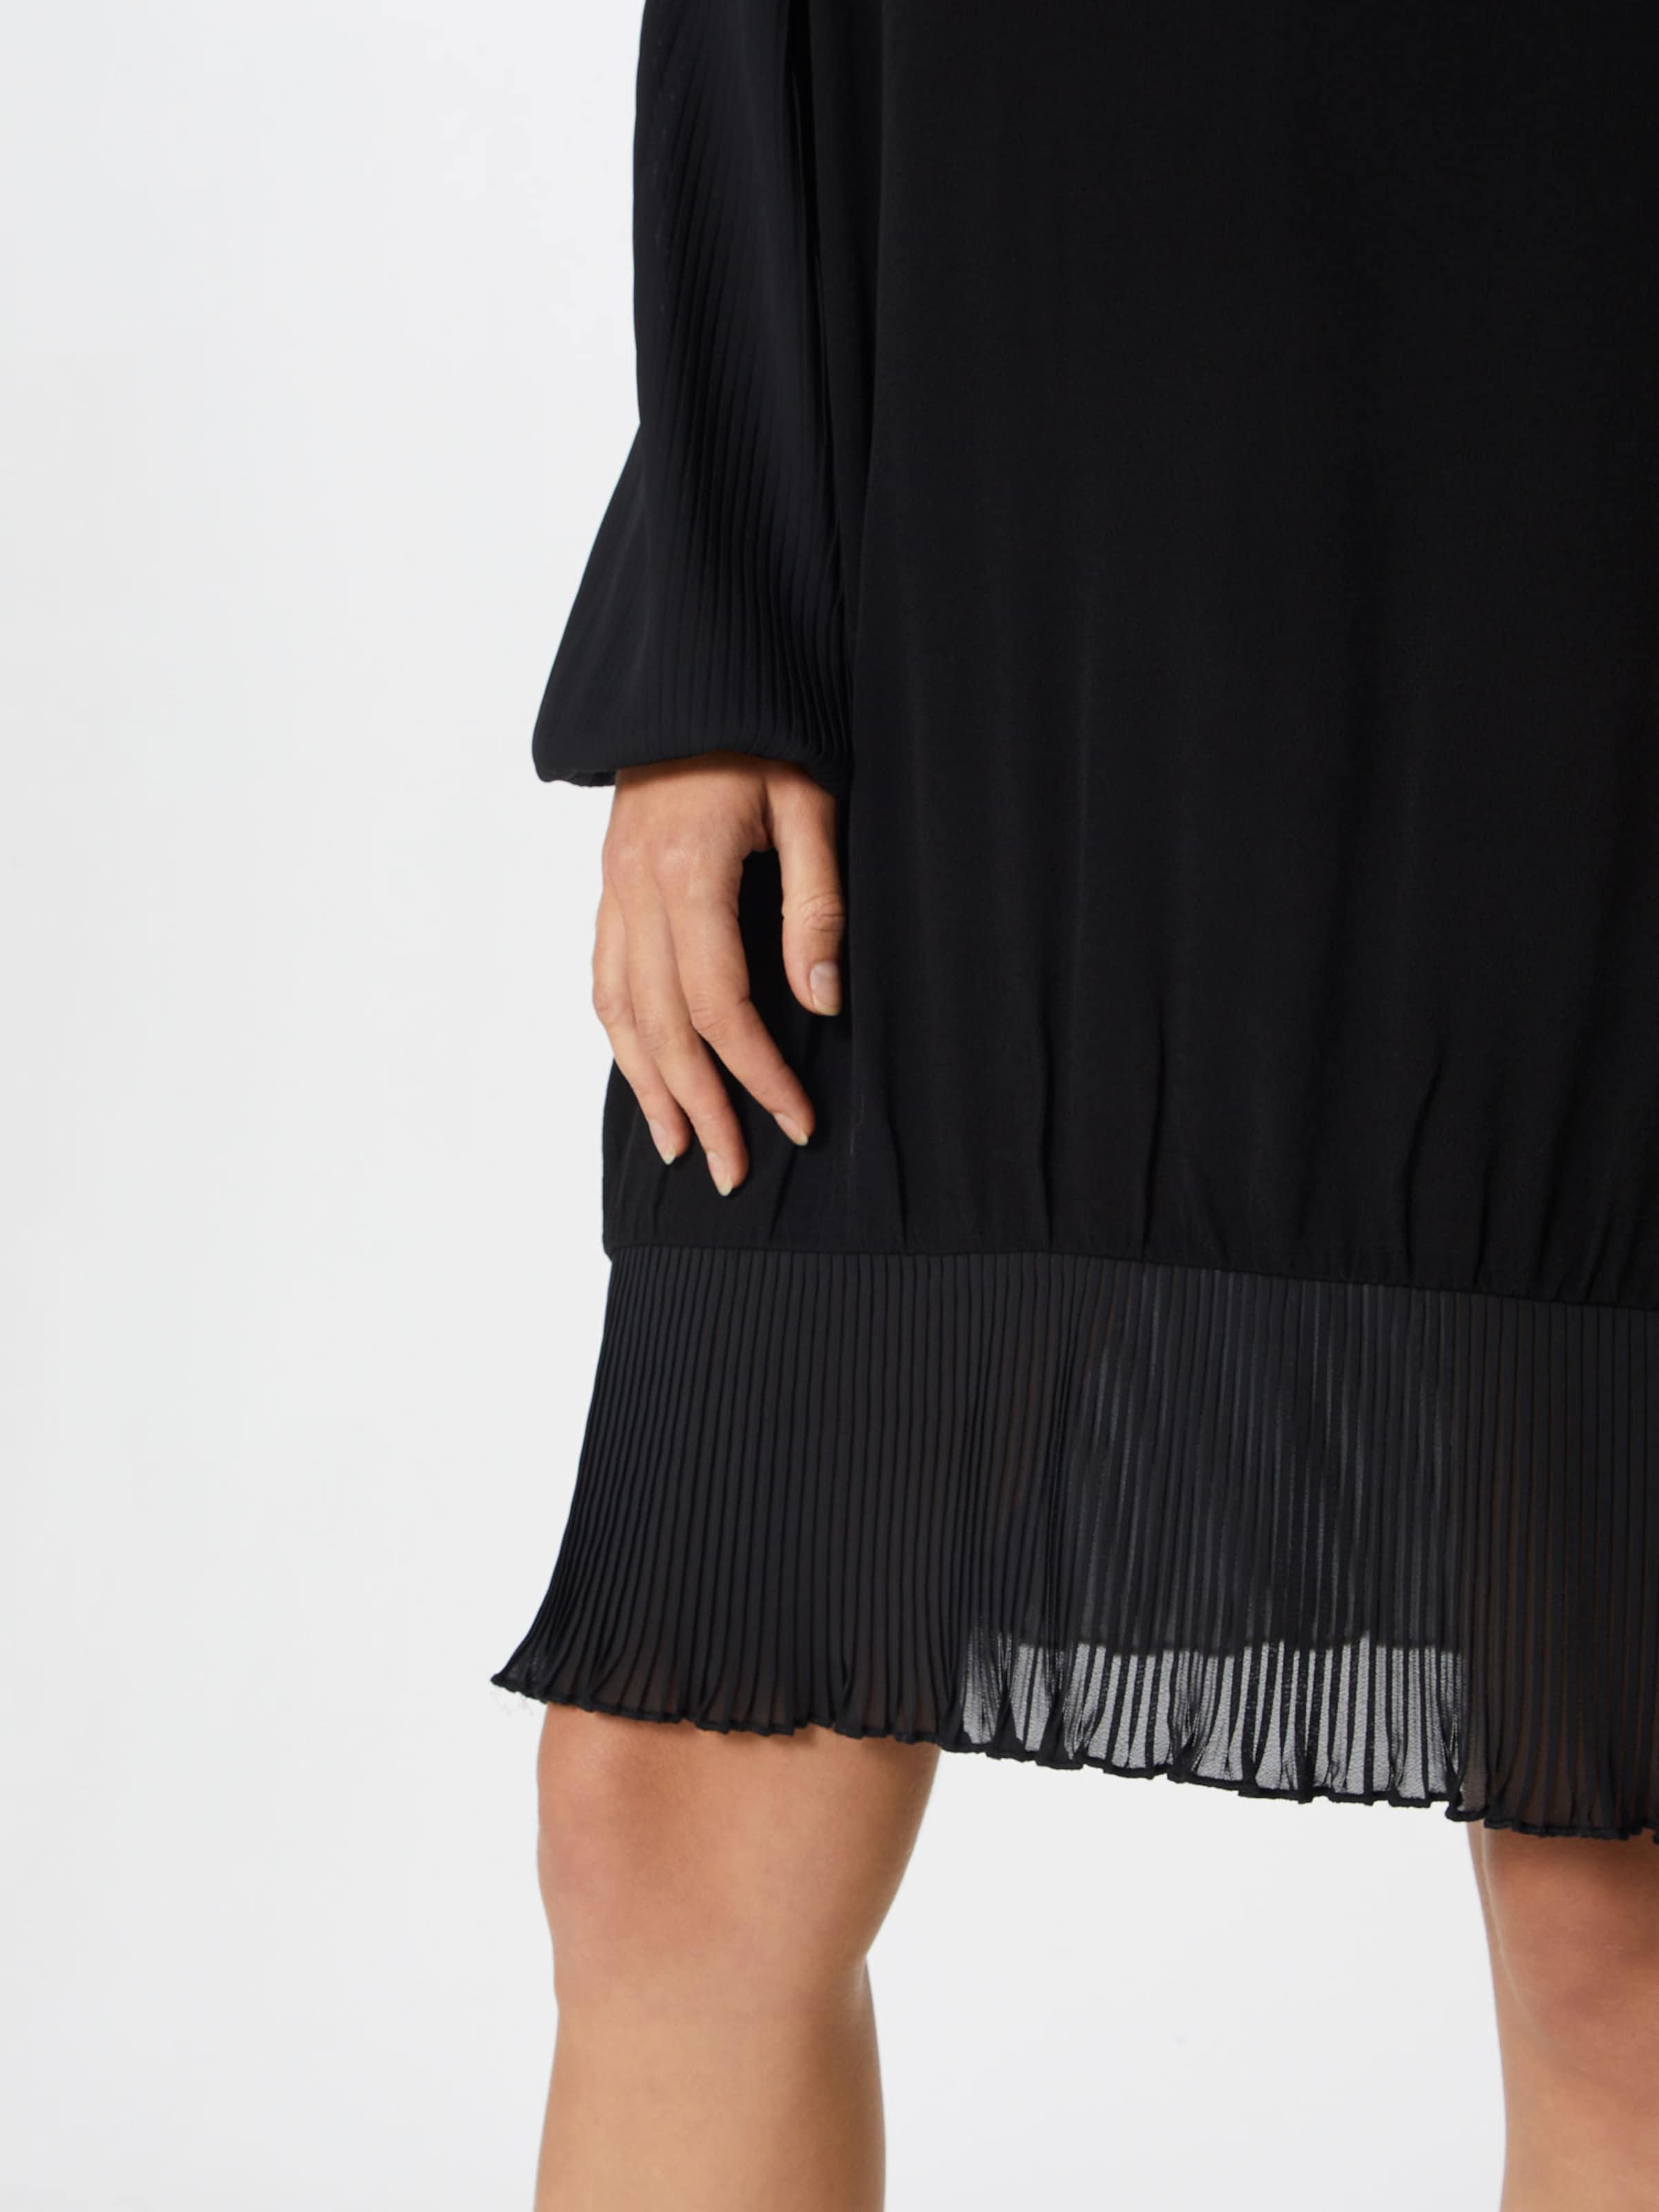 Robe Noir Minimum 'mosia' Minimum En Robe 'mosia' En Noir XwO80NPnk